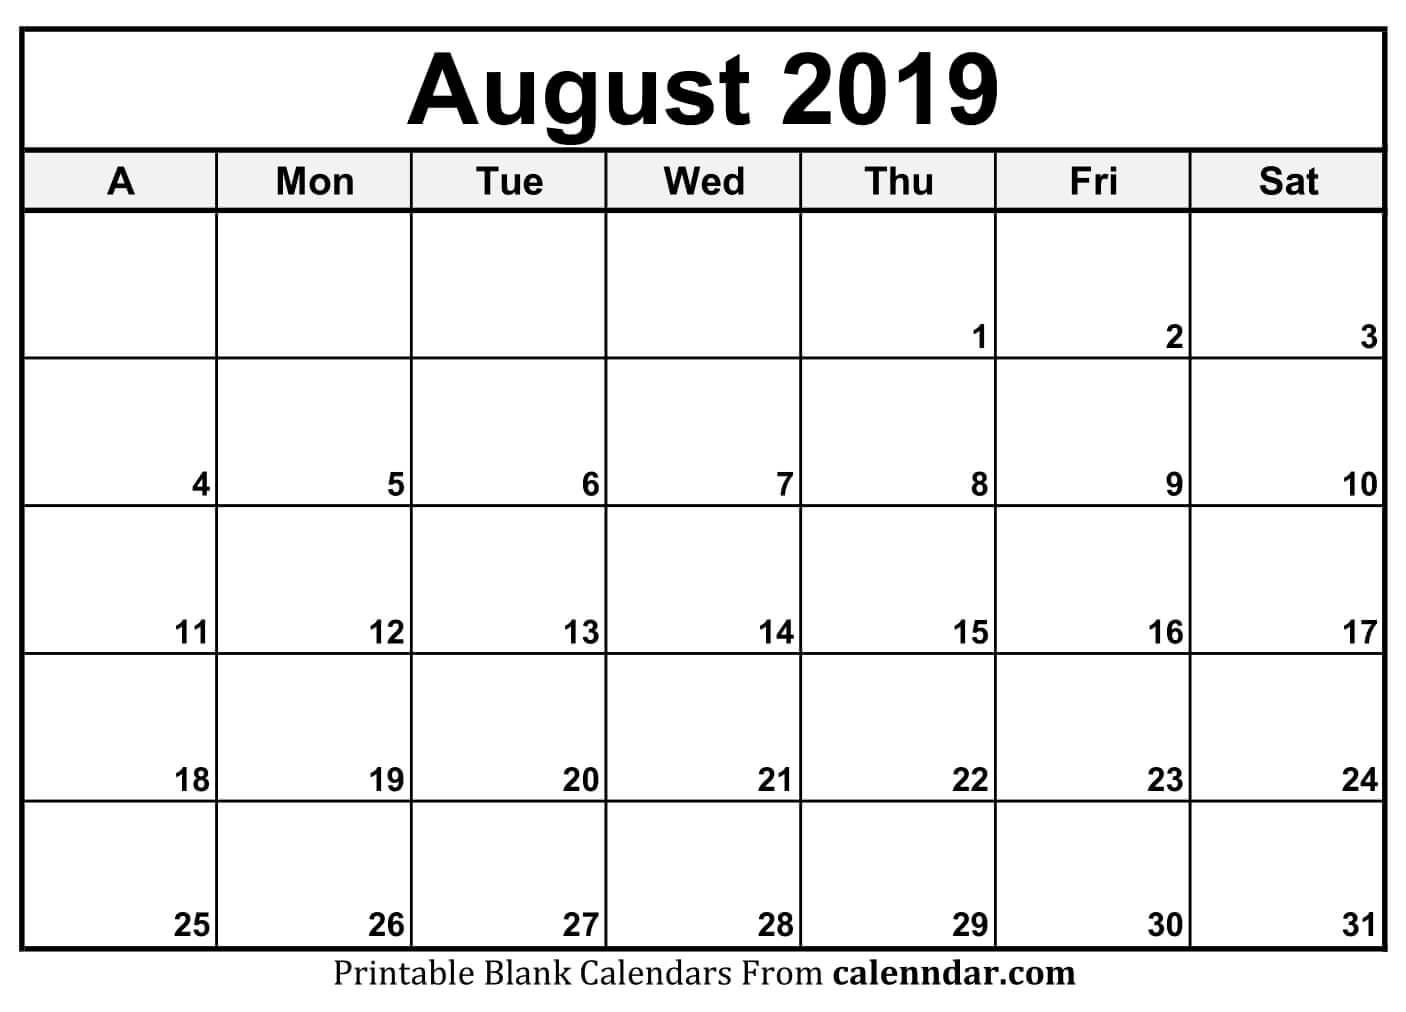 2019 August Printable Calendar